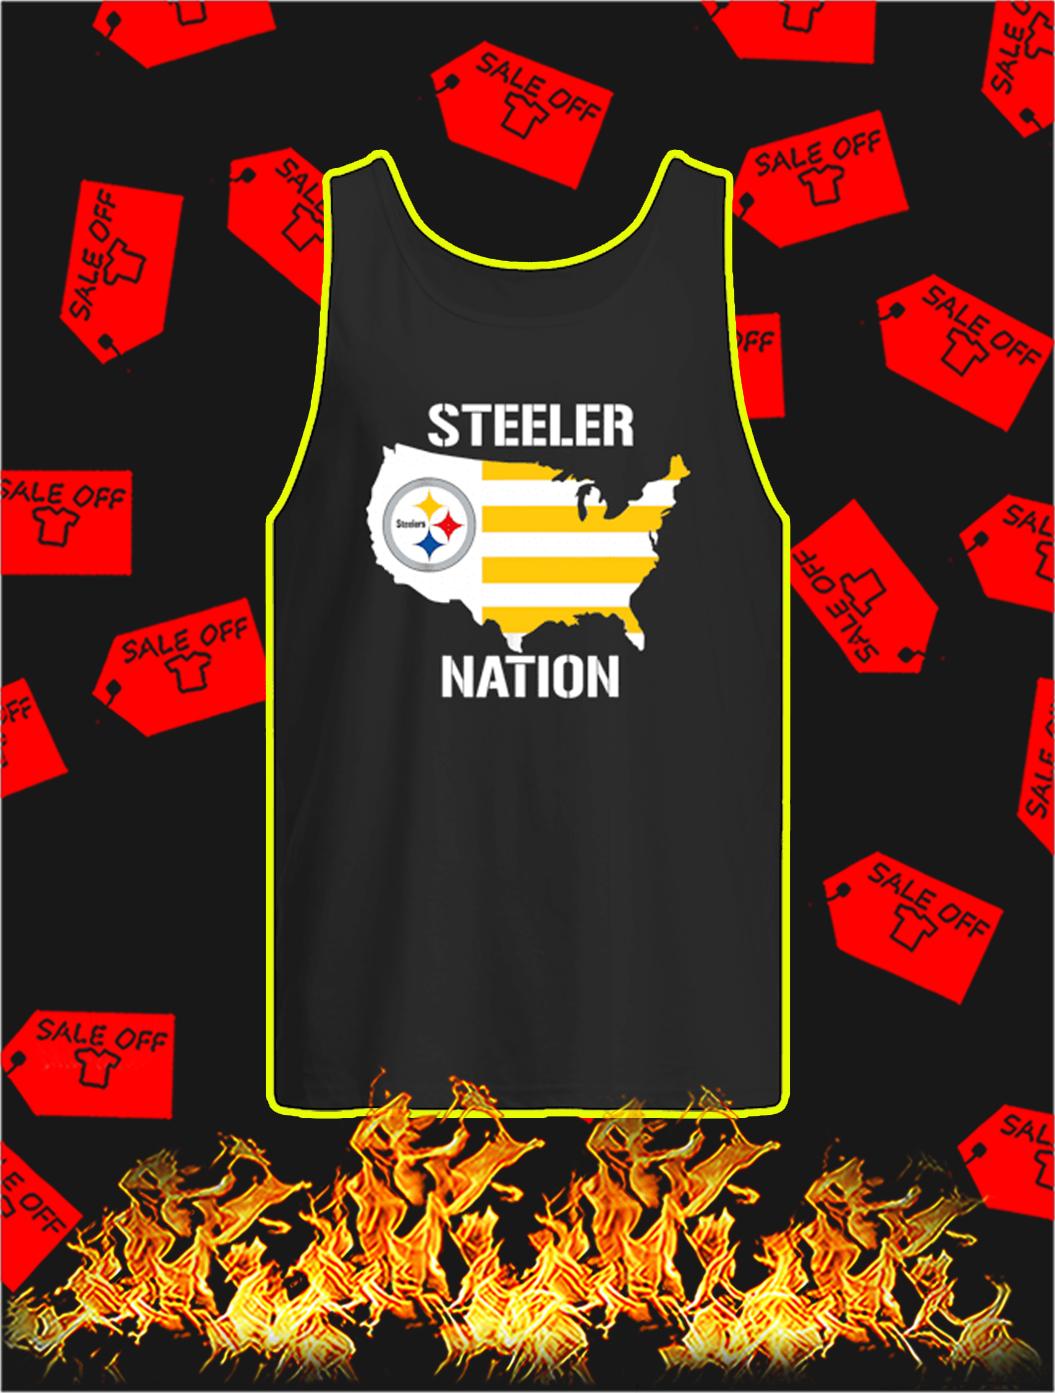 Steeler Nation tank top